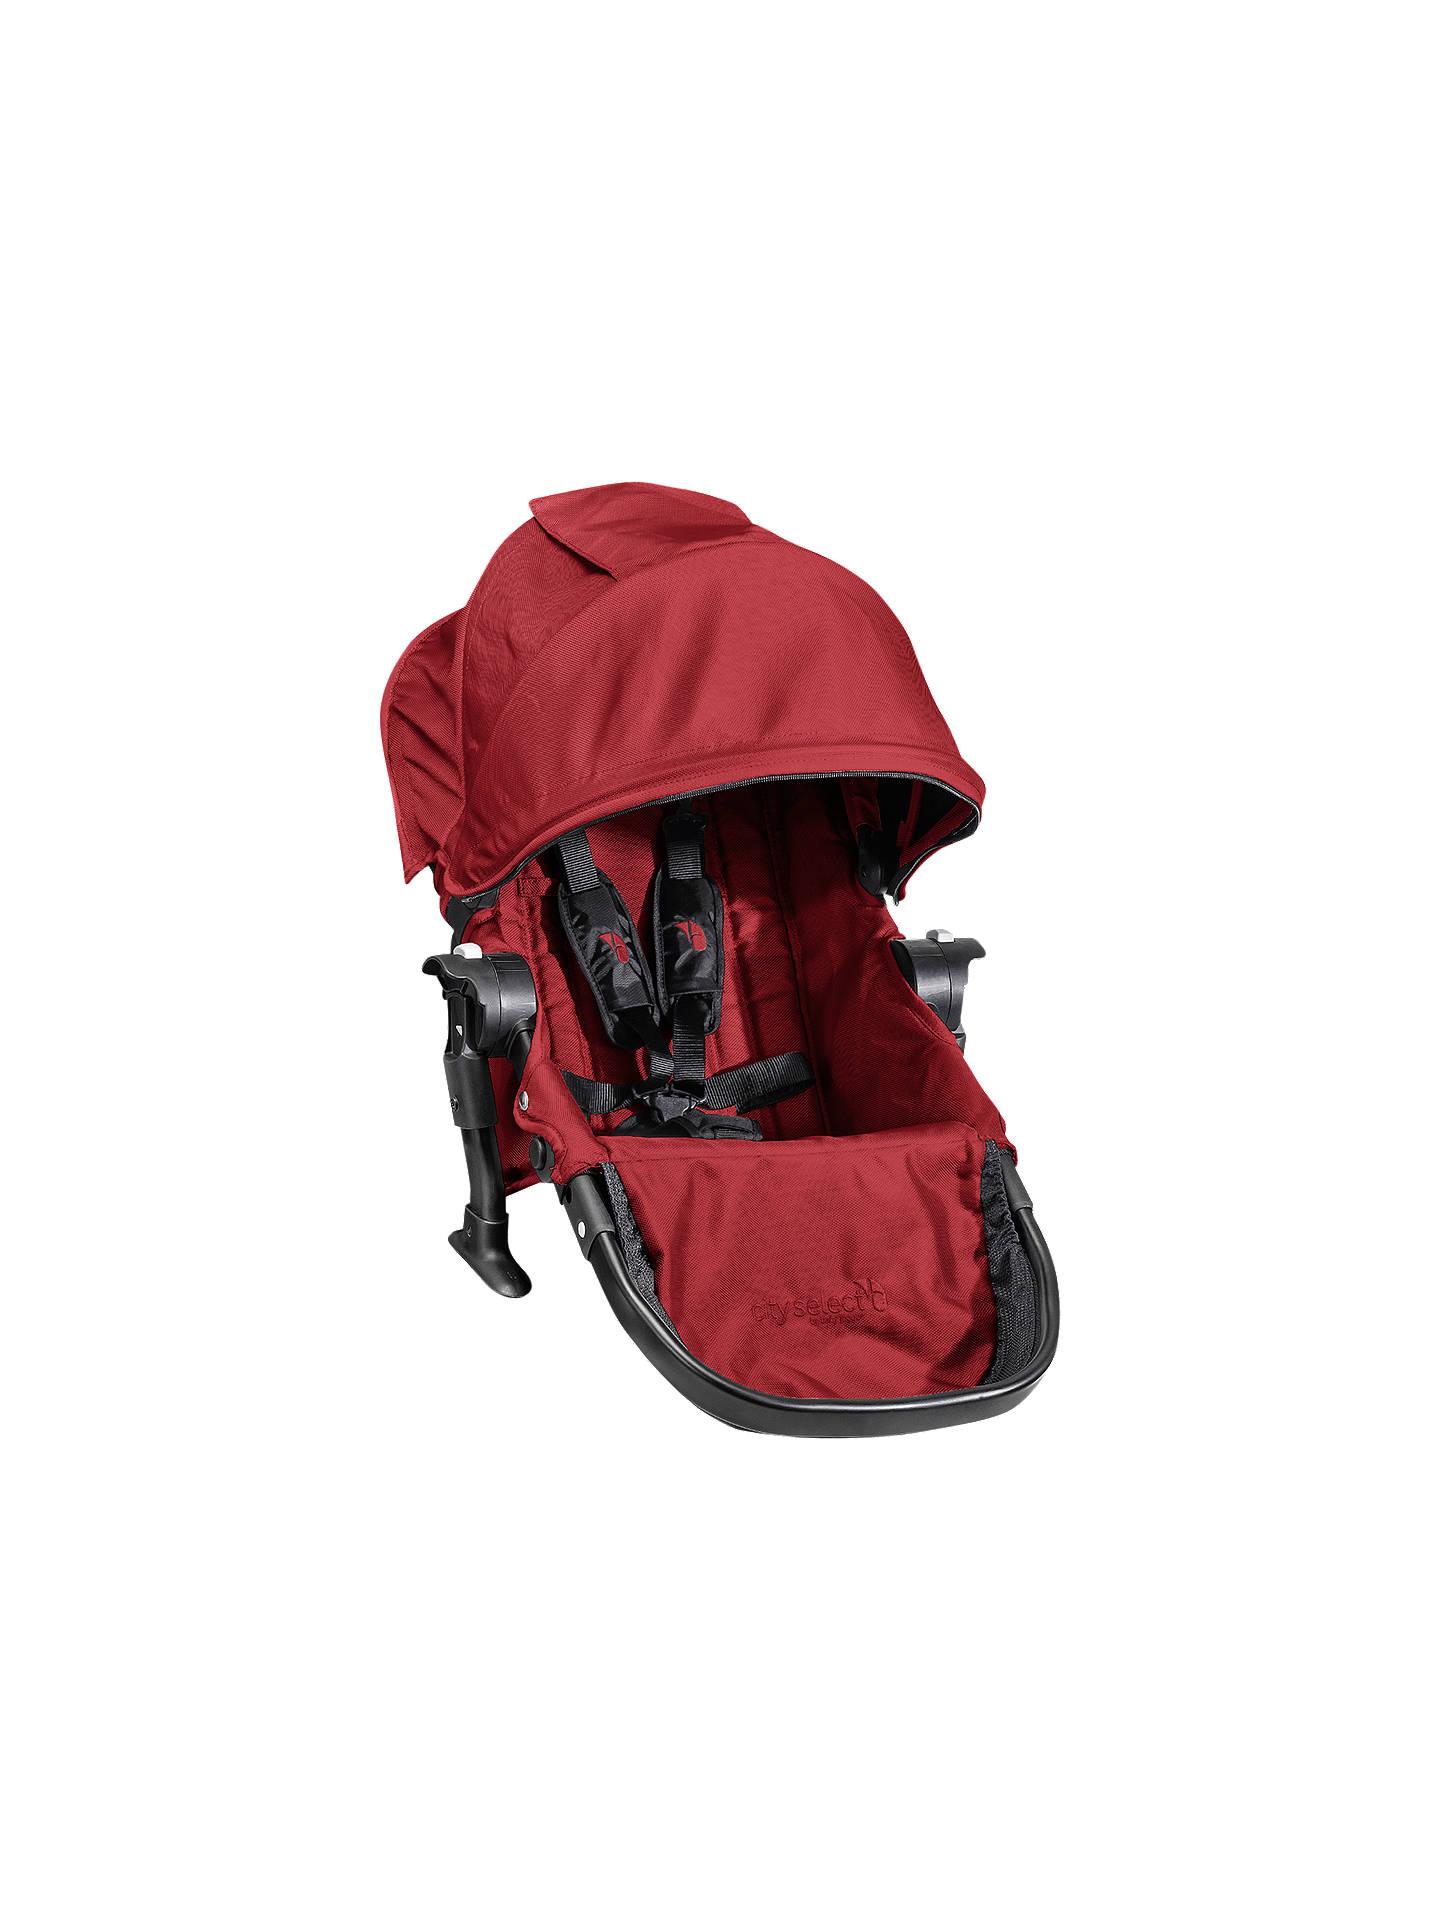 Baby Jogger City Select Second Seat Kit Garnet At John Lewis Partners